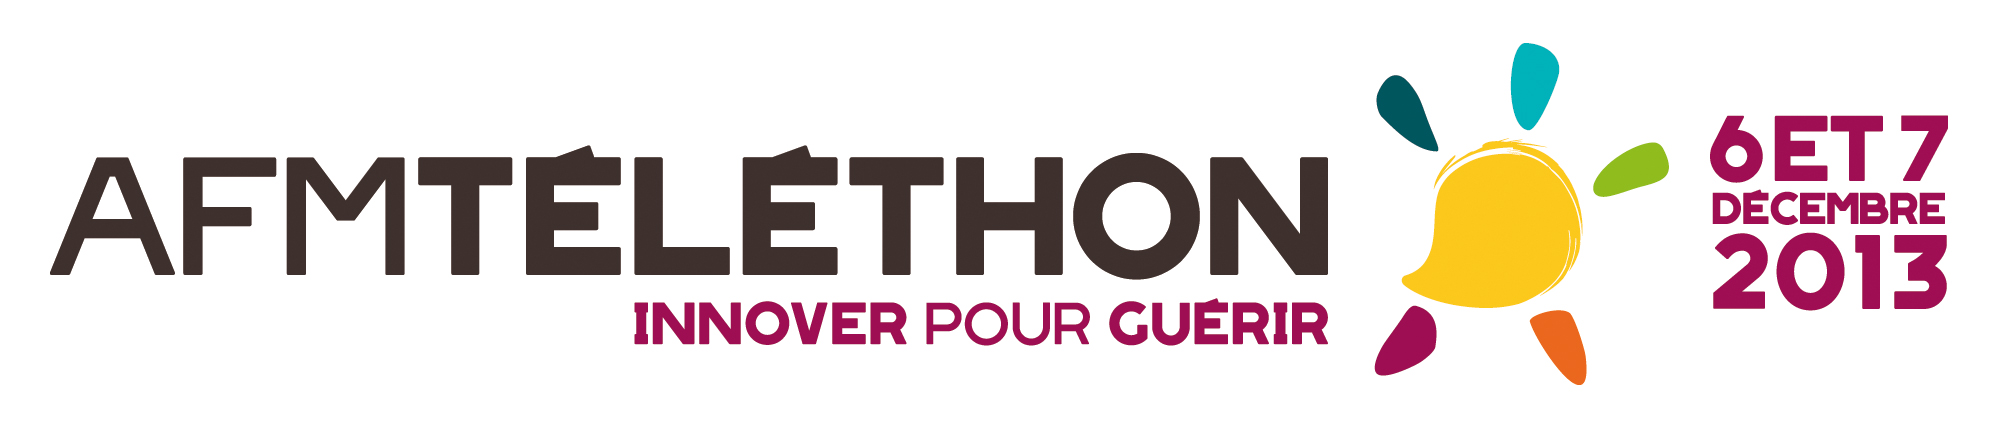 image logo telethon 2013